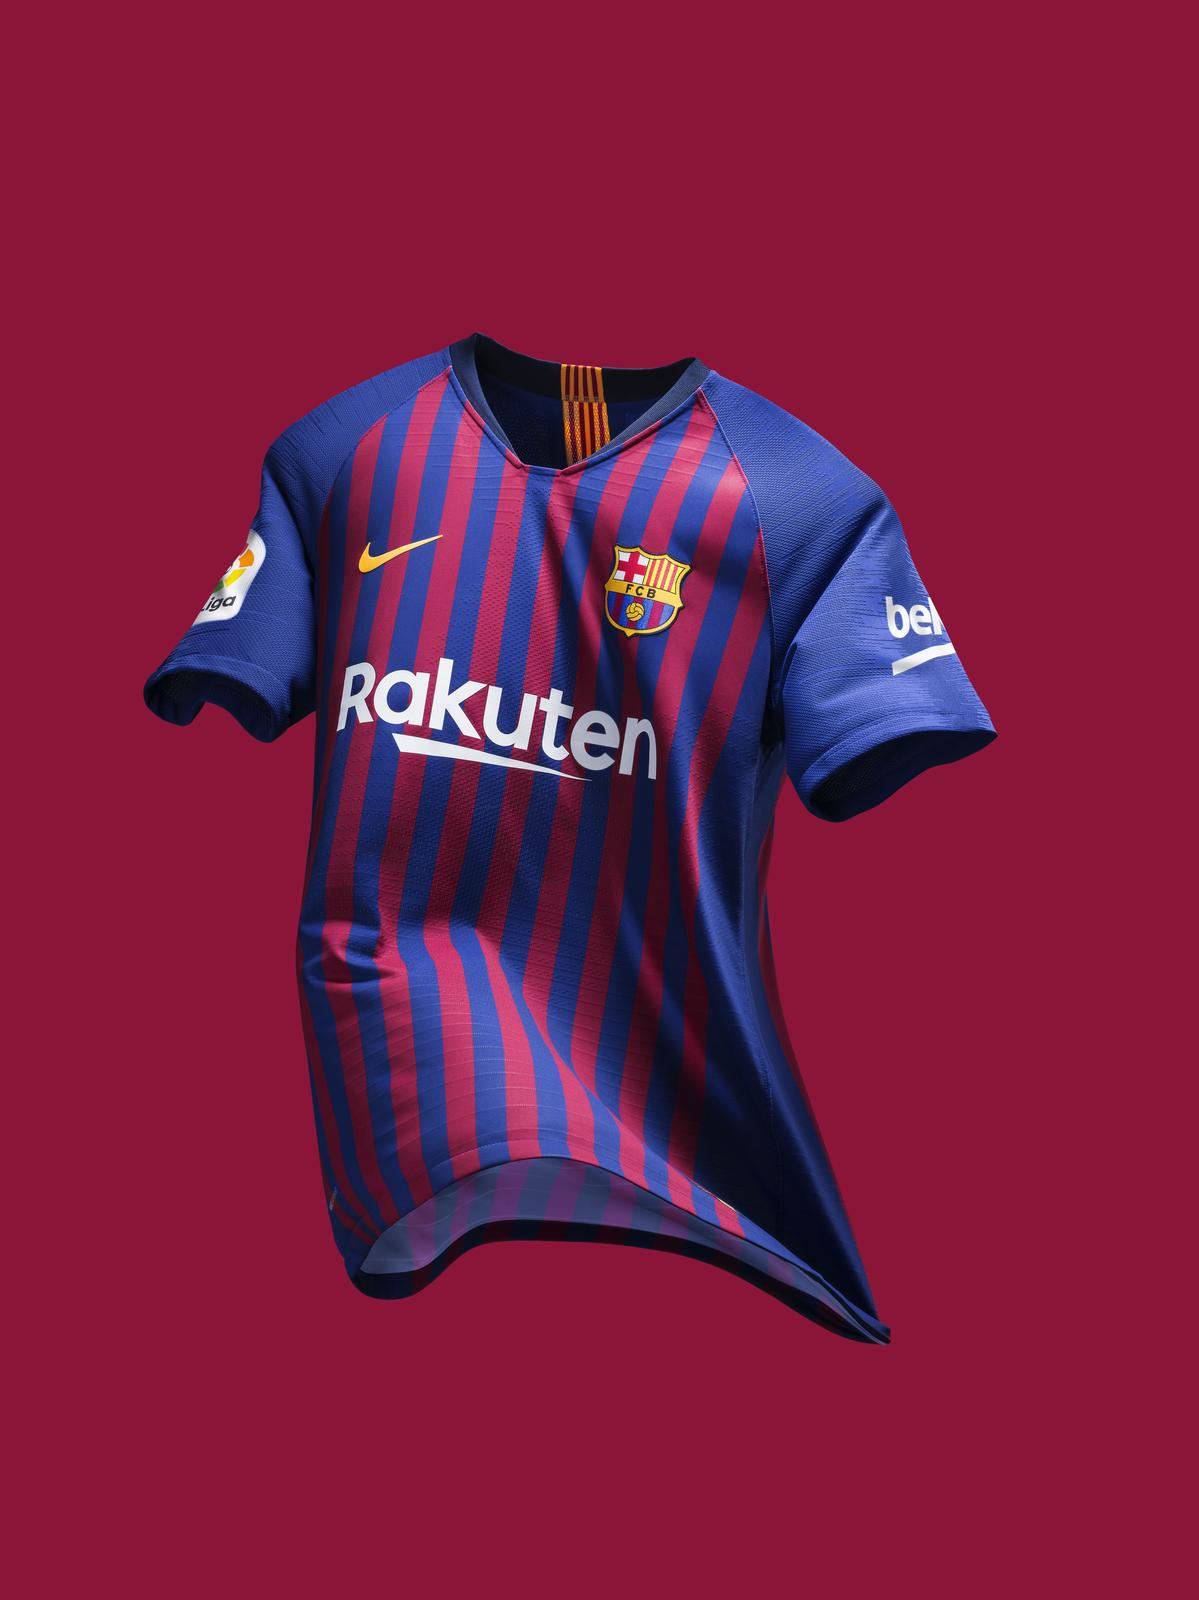 Dream League Soccer Kits World Cup 2018 | Toffee Art